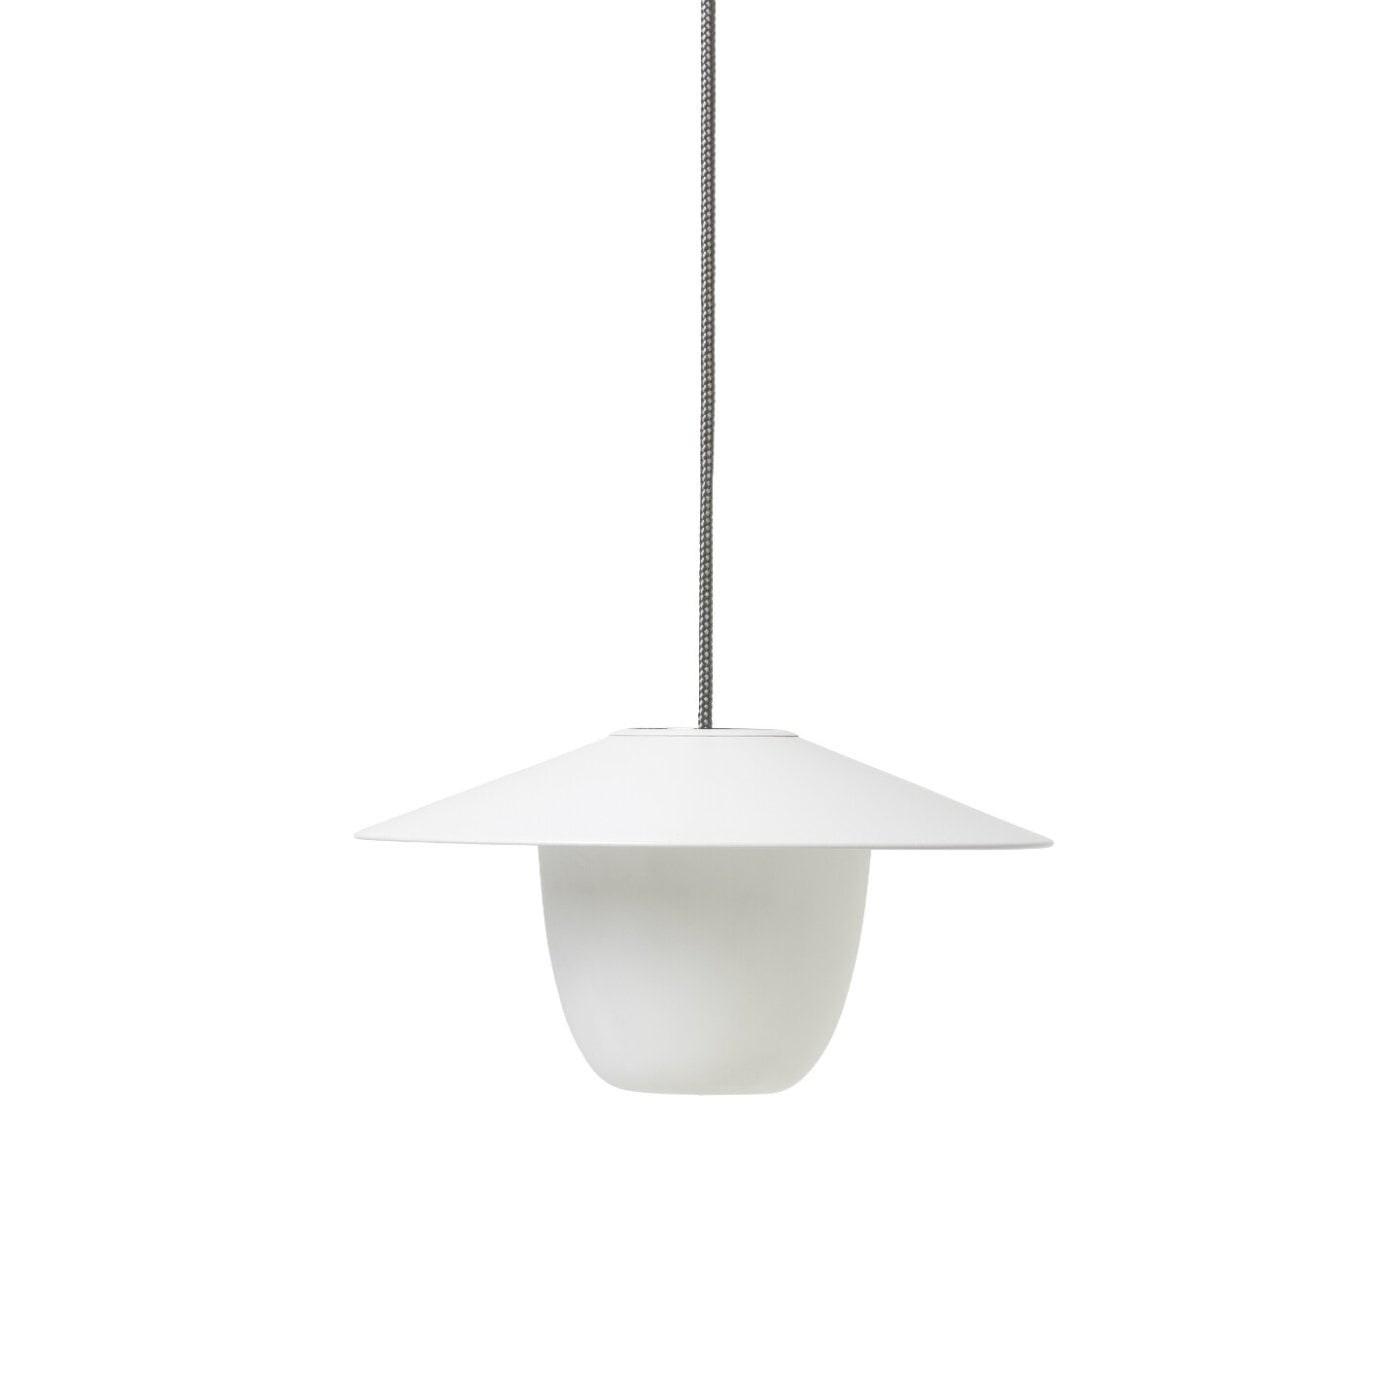 Obrázok z Prenosná LED lampa 120 cm biela